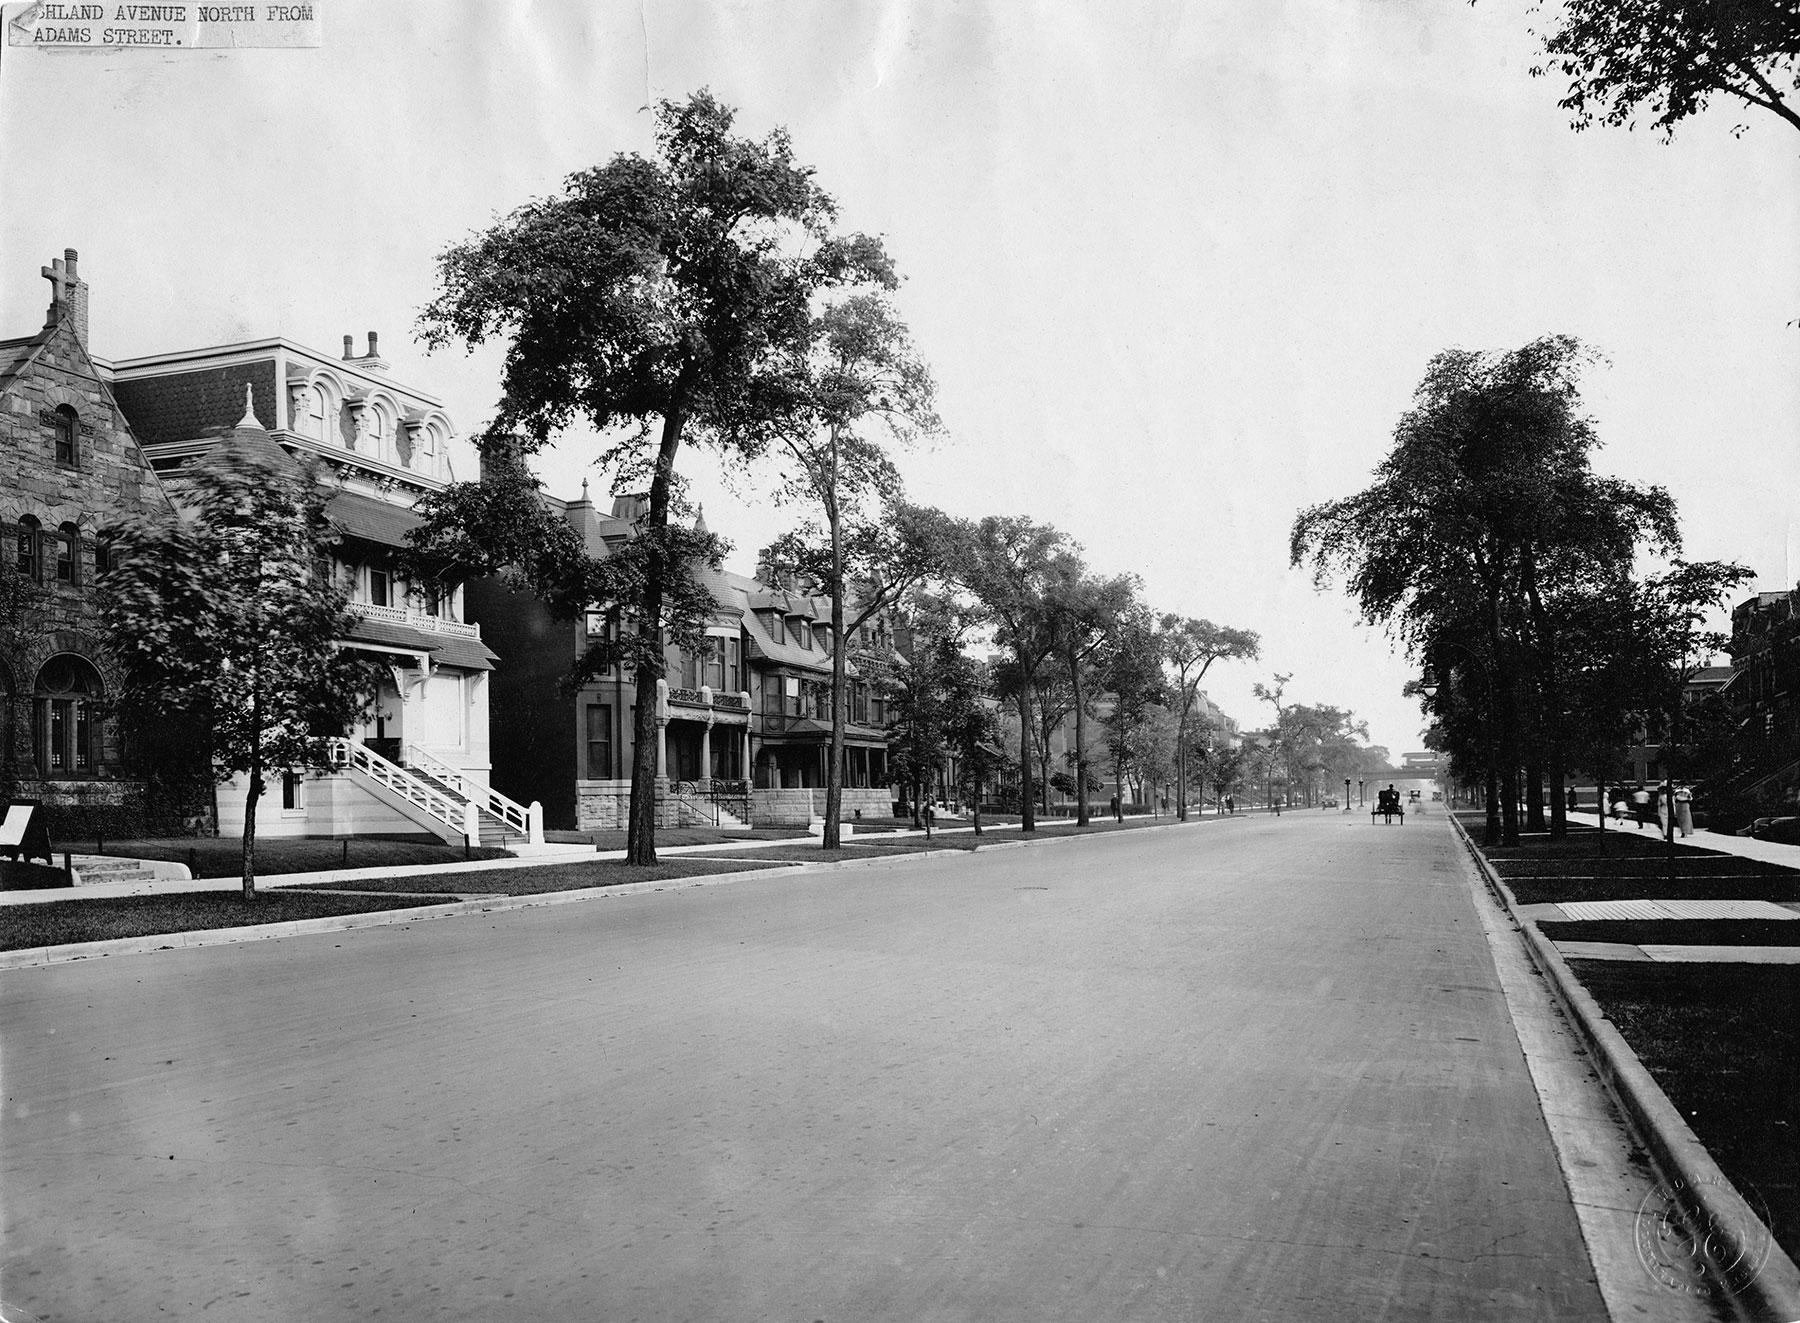 View of S. Ashland Avenue near W. Adams Street, ca. 1900. Photo courtesy of Chicago History Museum, iChi 27335.